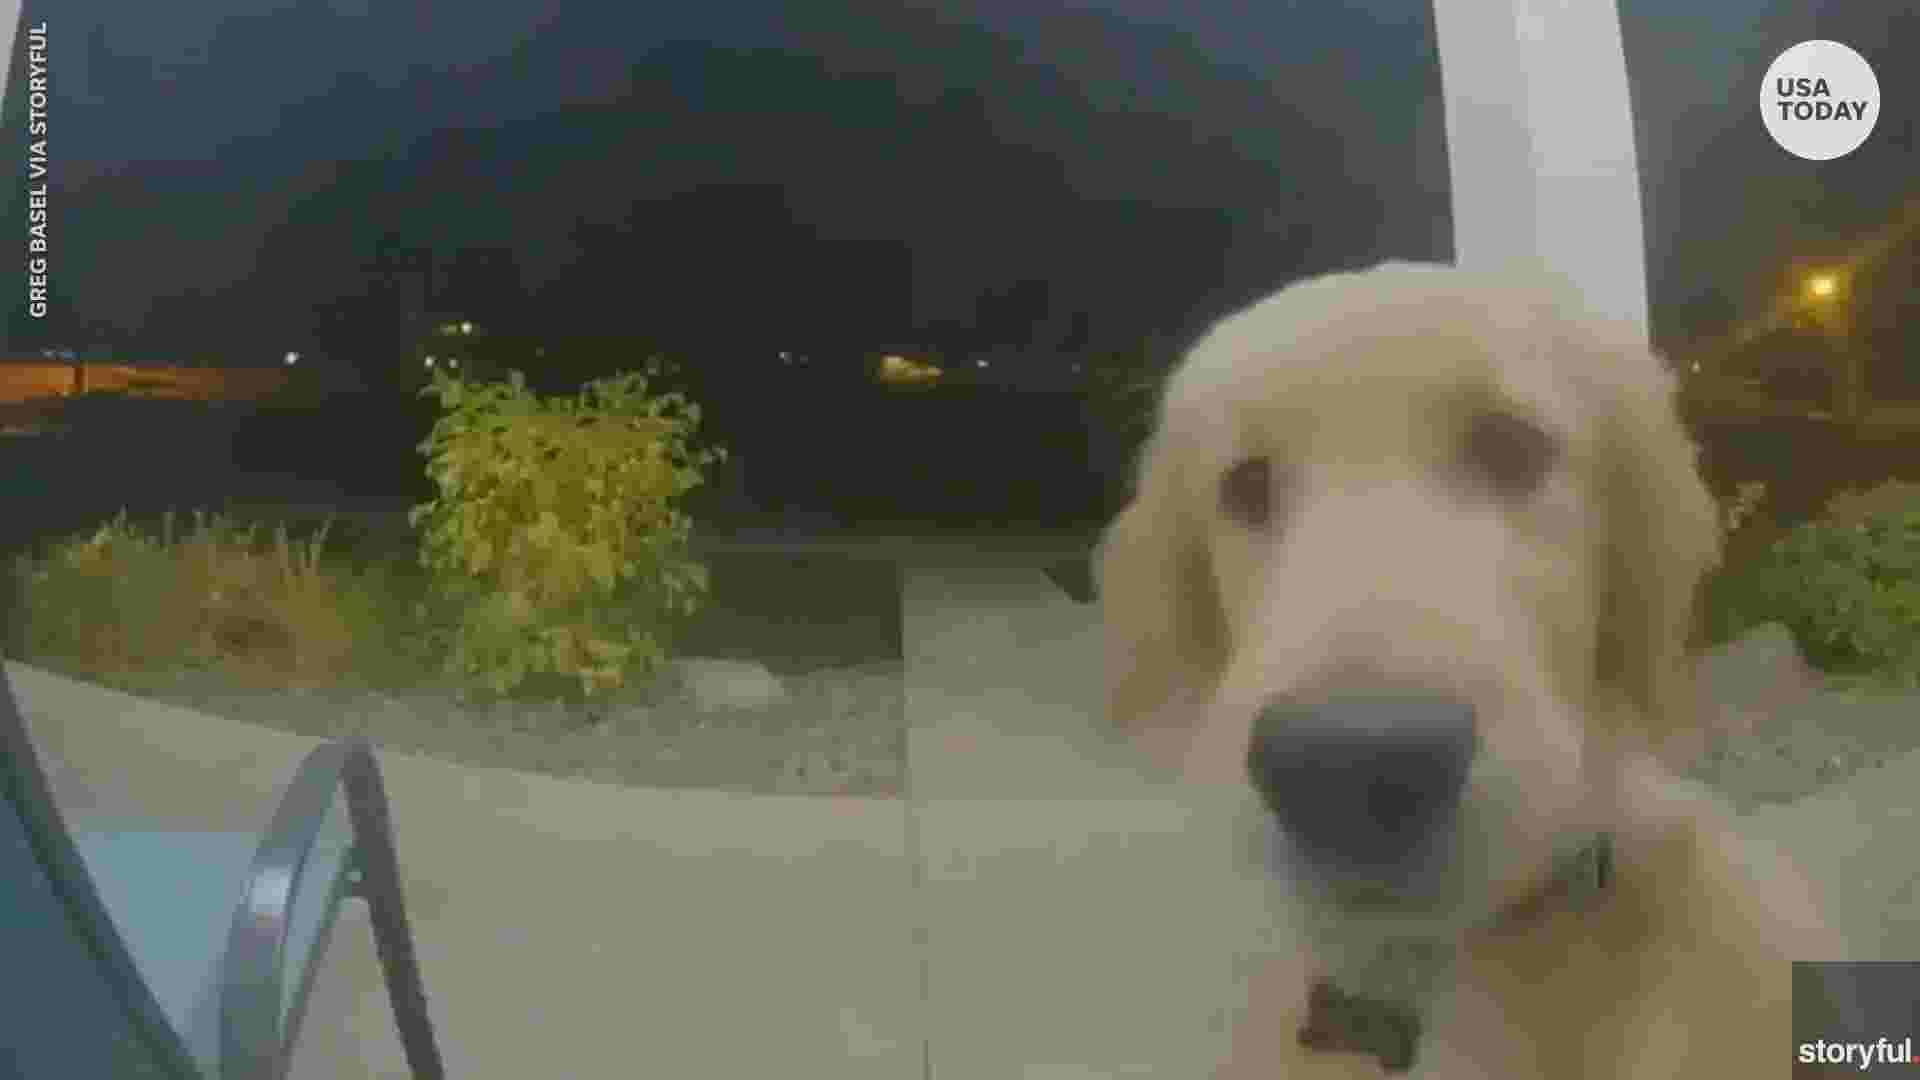 Golden retriever puppy escapes, rings doorbell